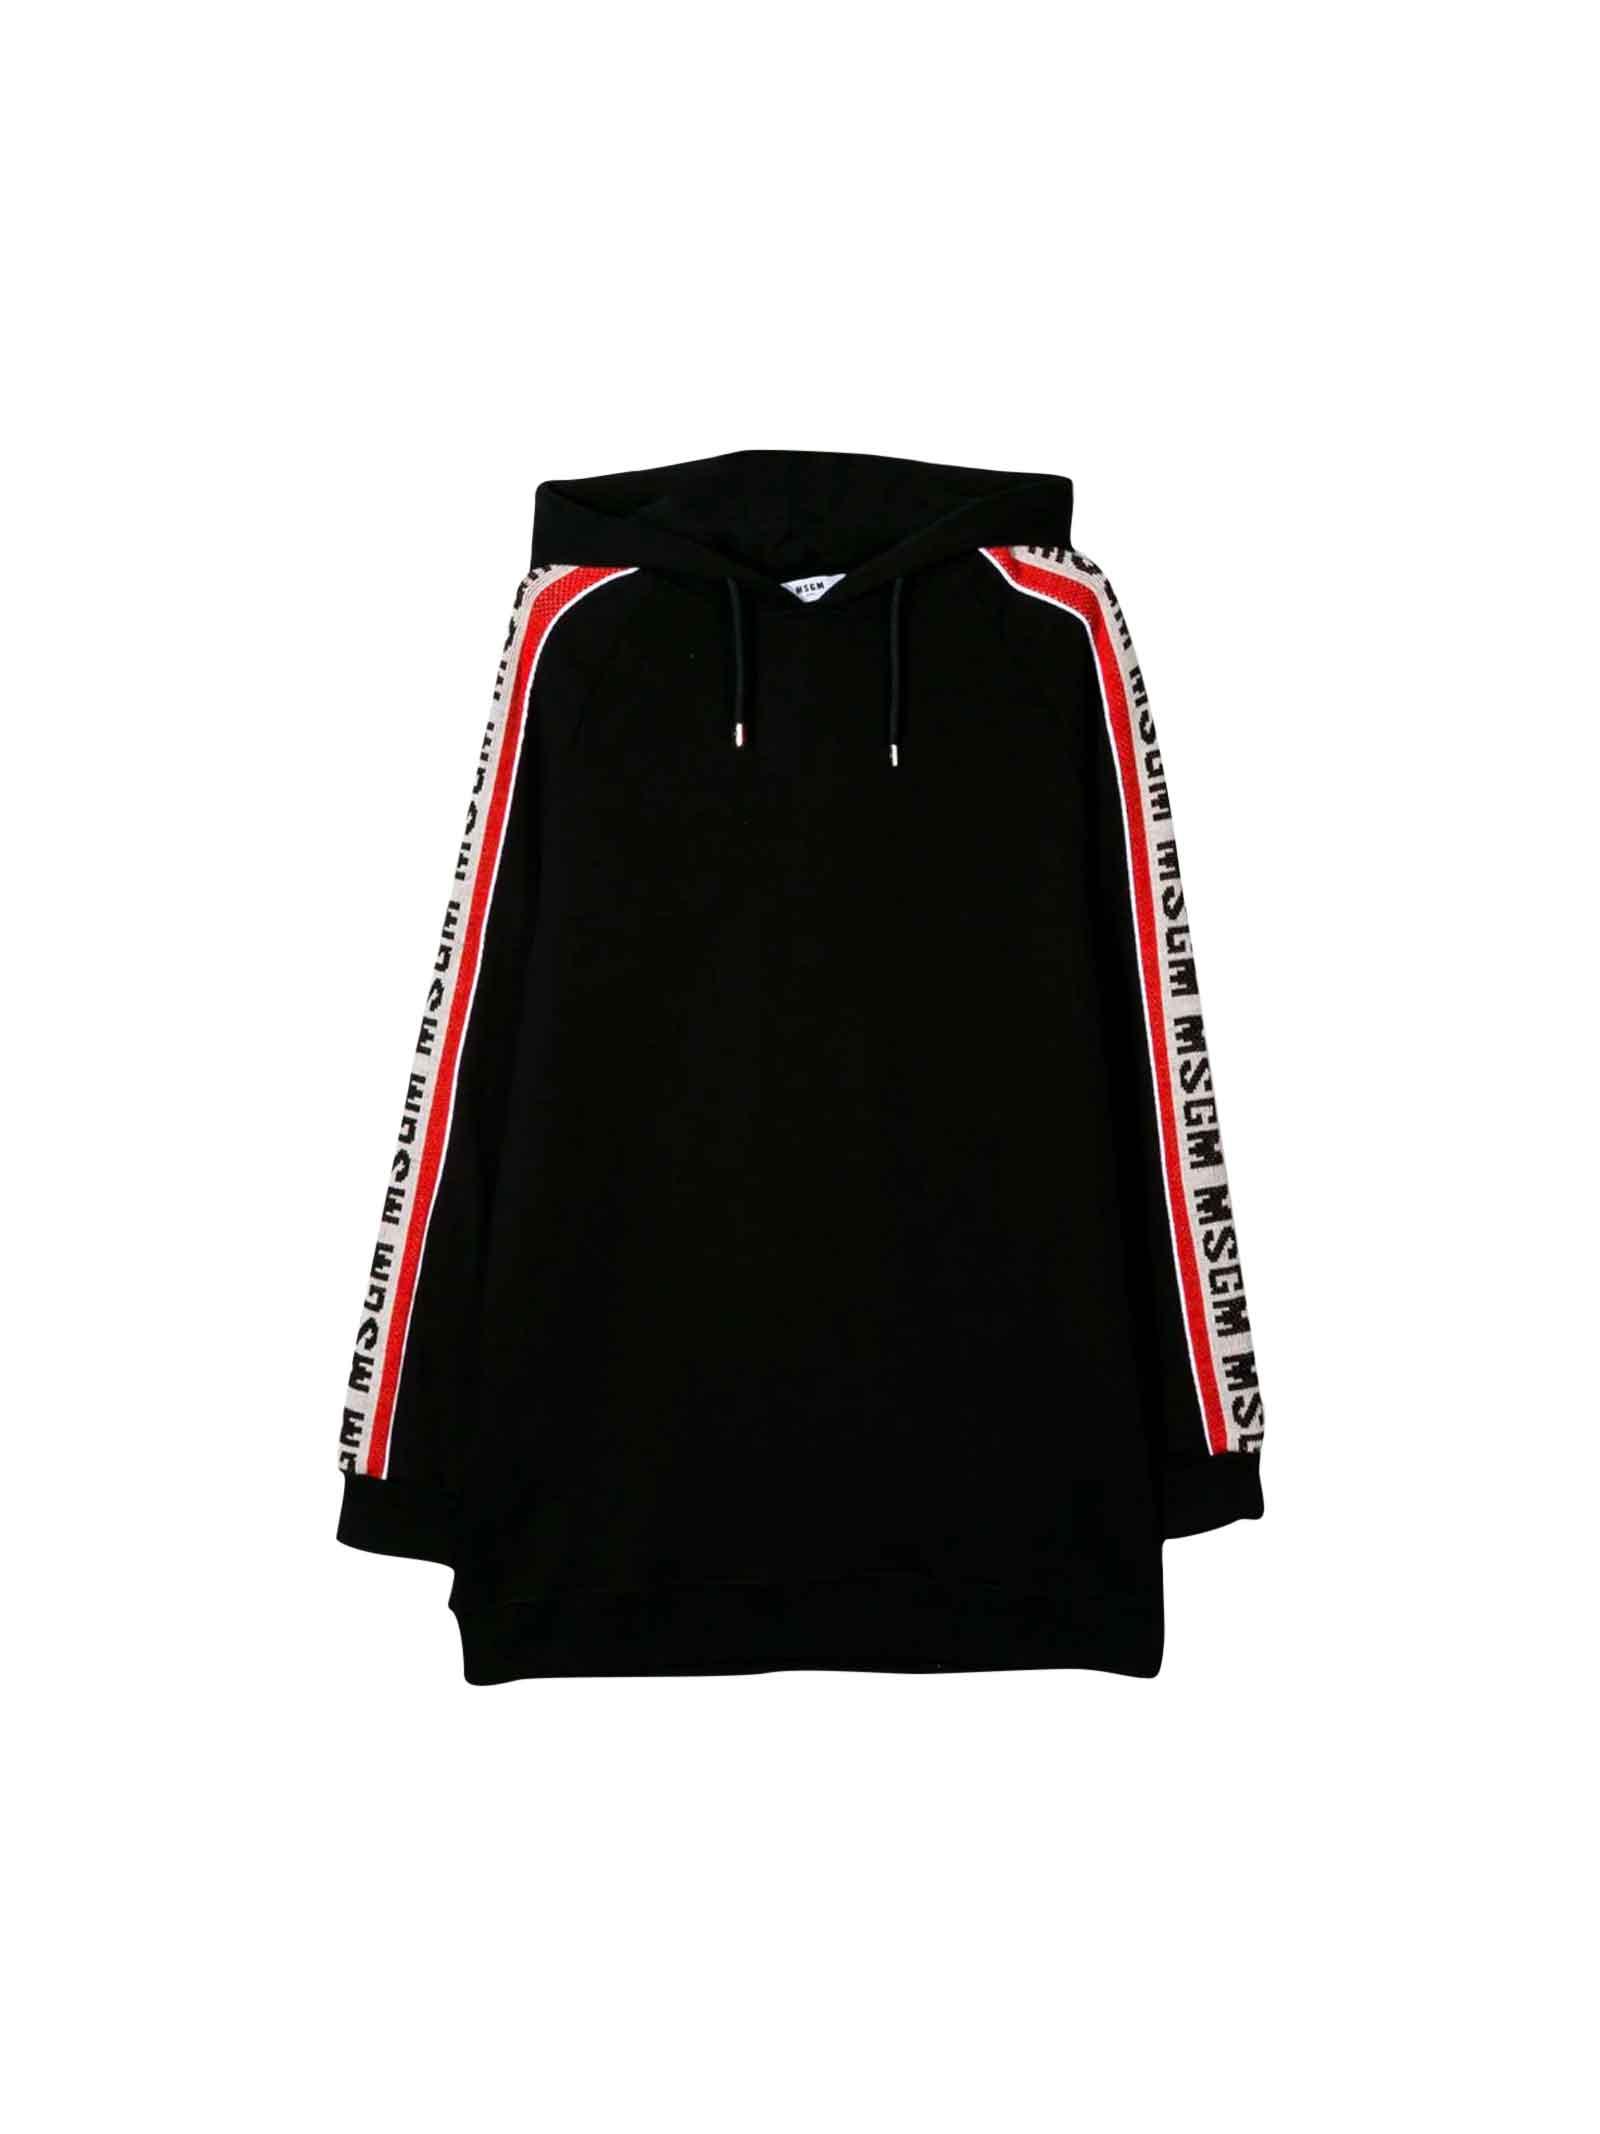 MSGM Black Sweatshirt Dress Teen